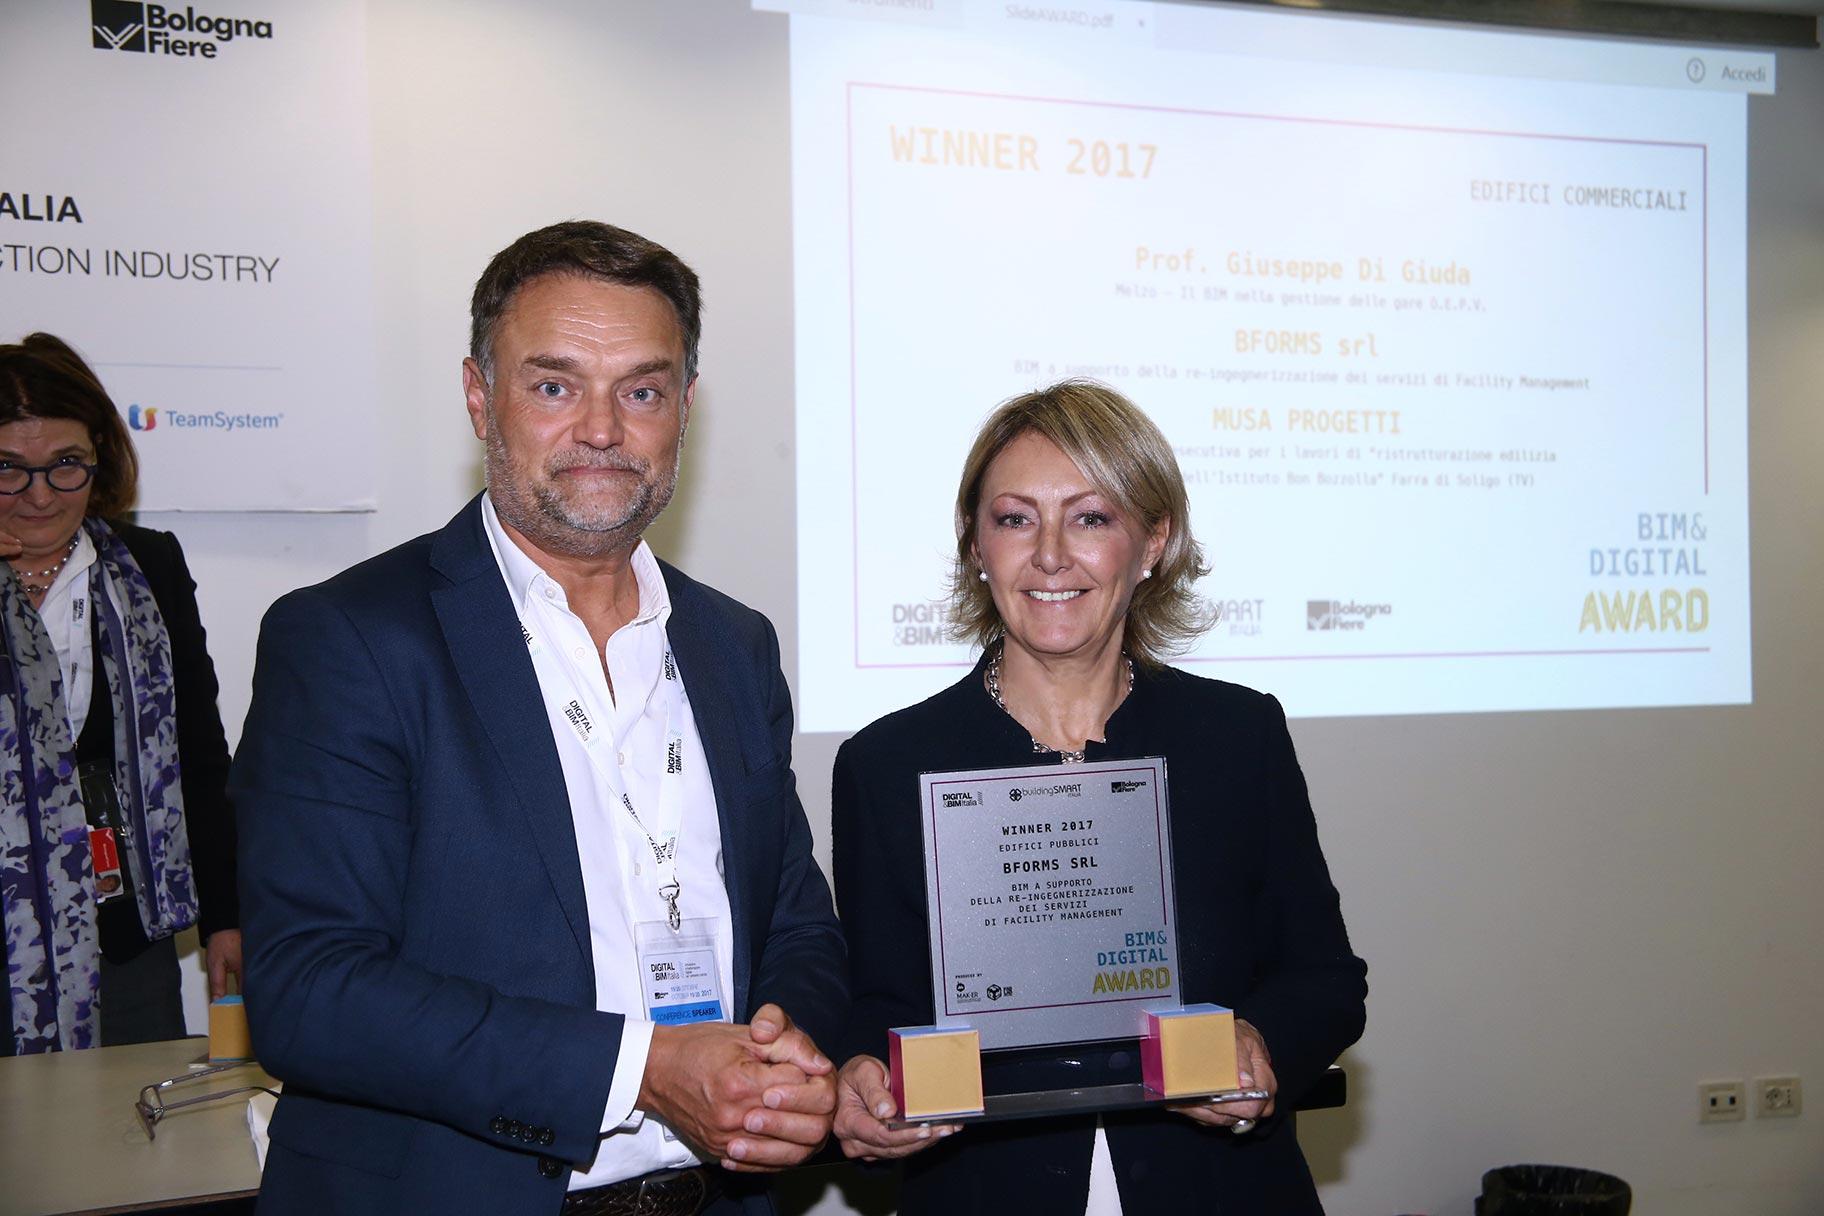 BIM&Digital Award 2017, Bologna